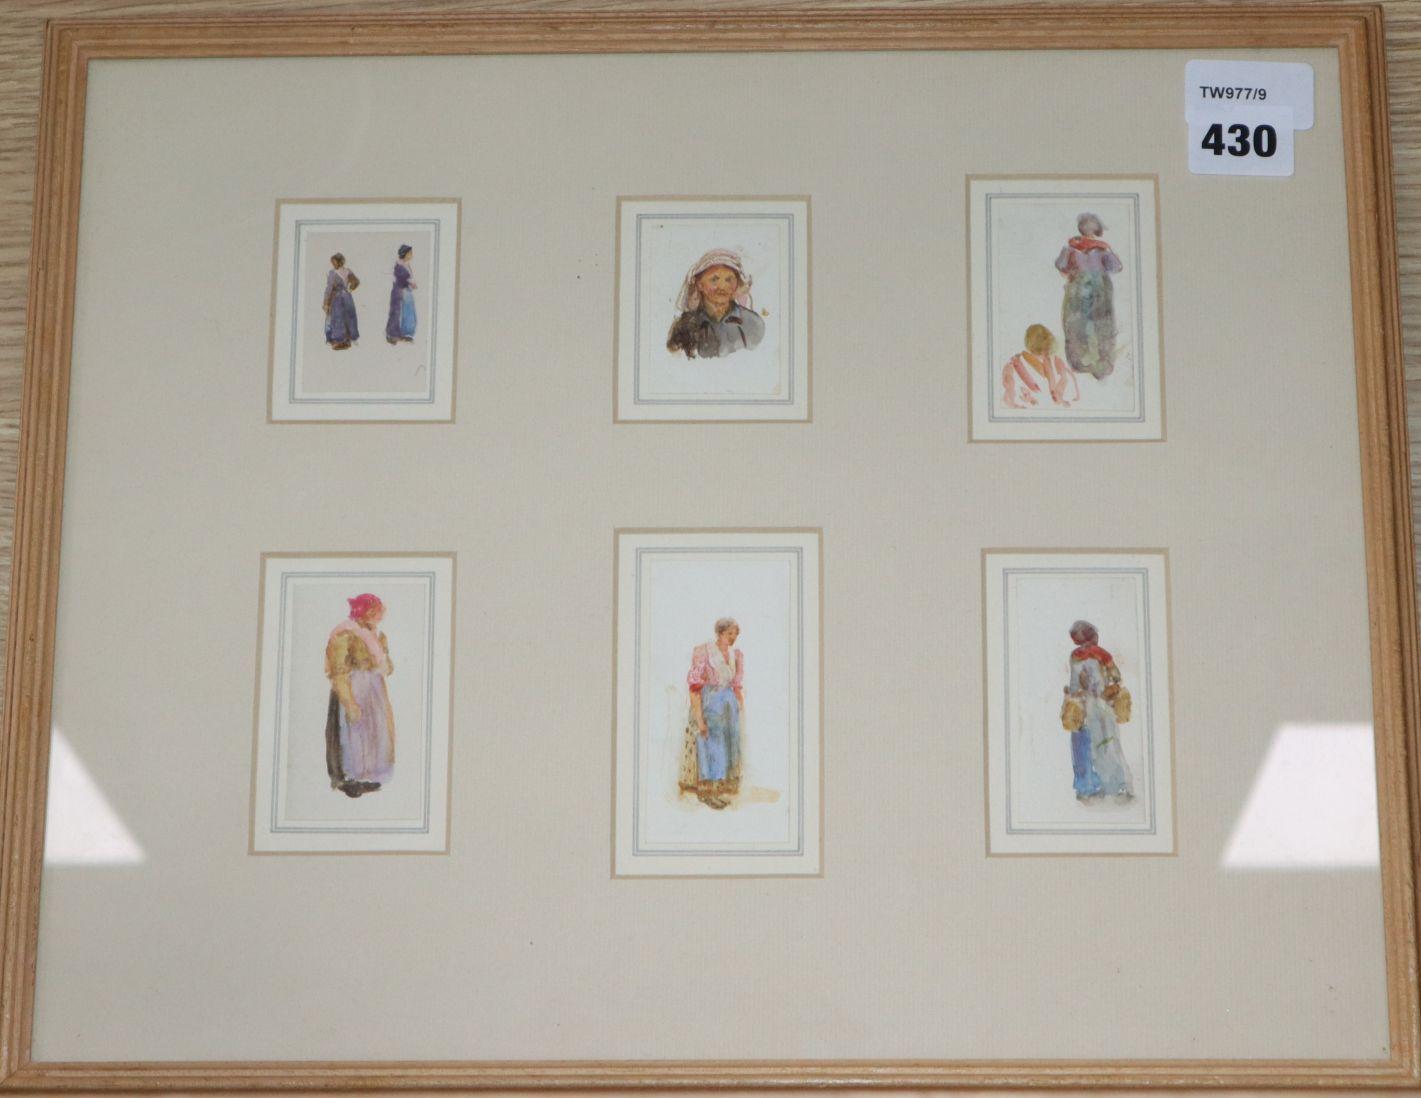 Lot 430 - Helen Allingham R. W. S. (1848-1926), Six small figure studies, framed together, watercolour,